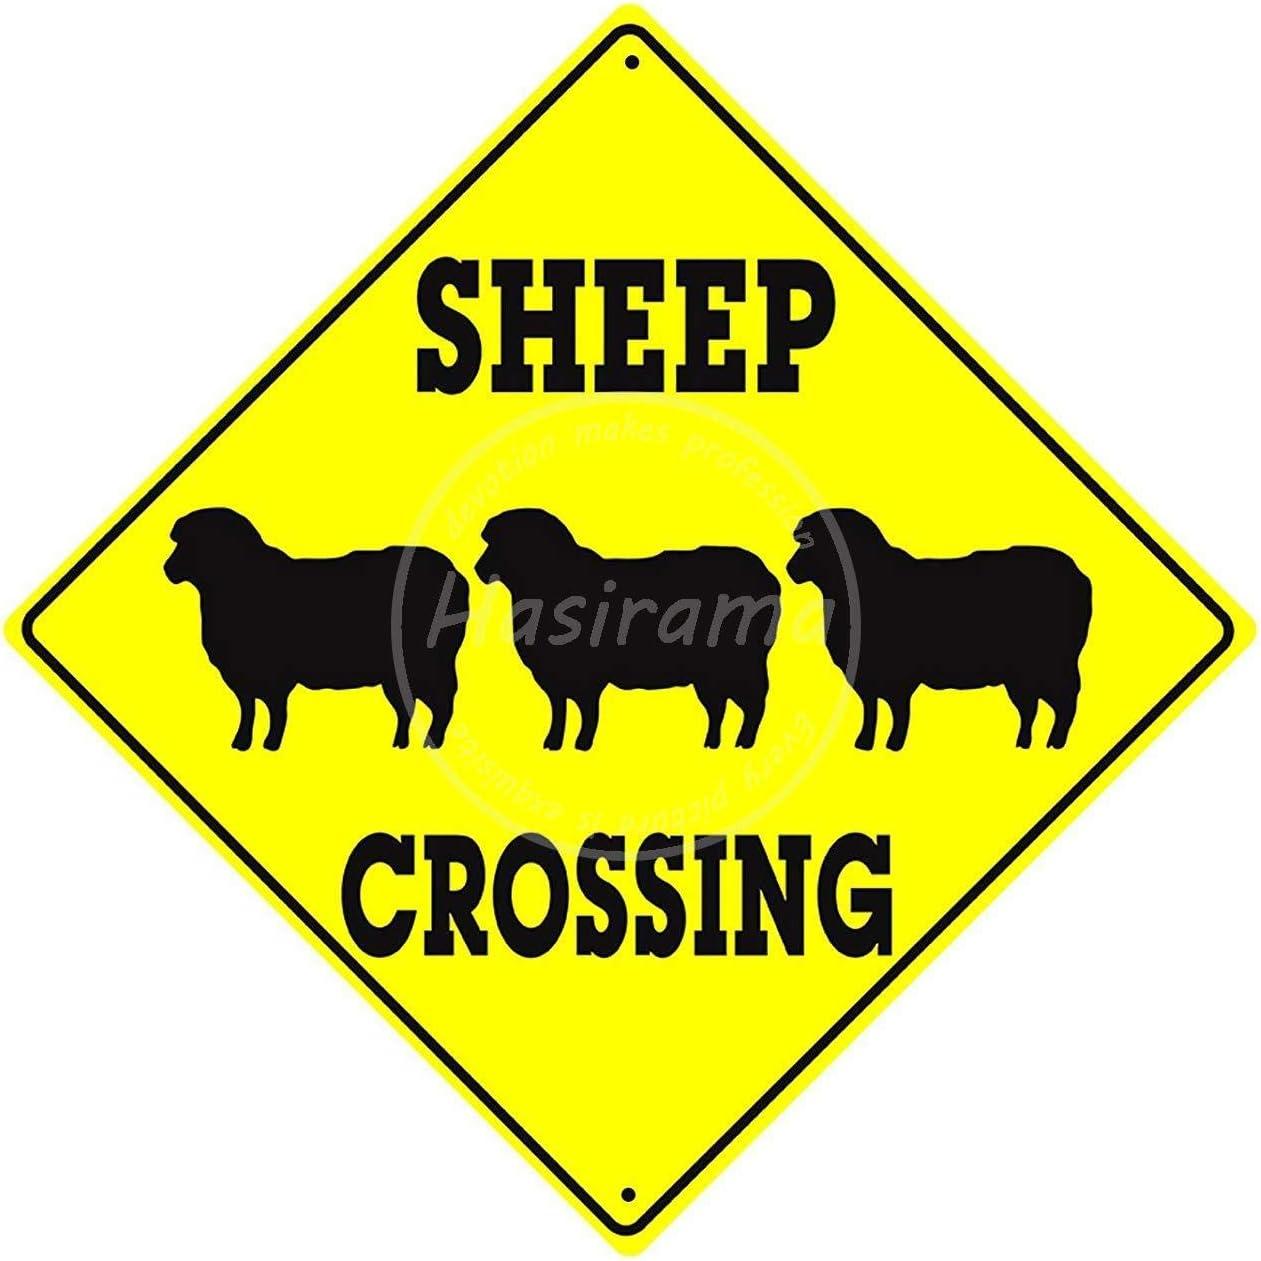 NOT Sheep Crossing Tin Wall Sign Retro Metal Poster Plaque Hanging Warning Vintage Art Yard Garden Signs Band Cafe Bar Pub Stadium Cinema Store Gift